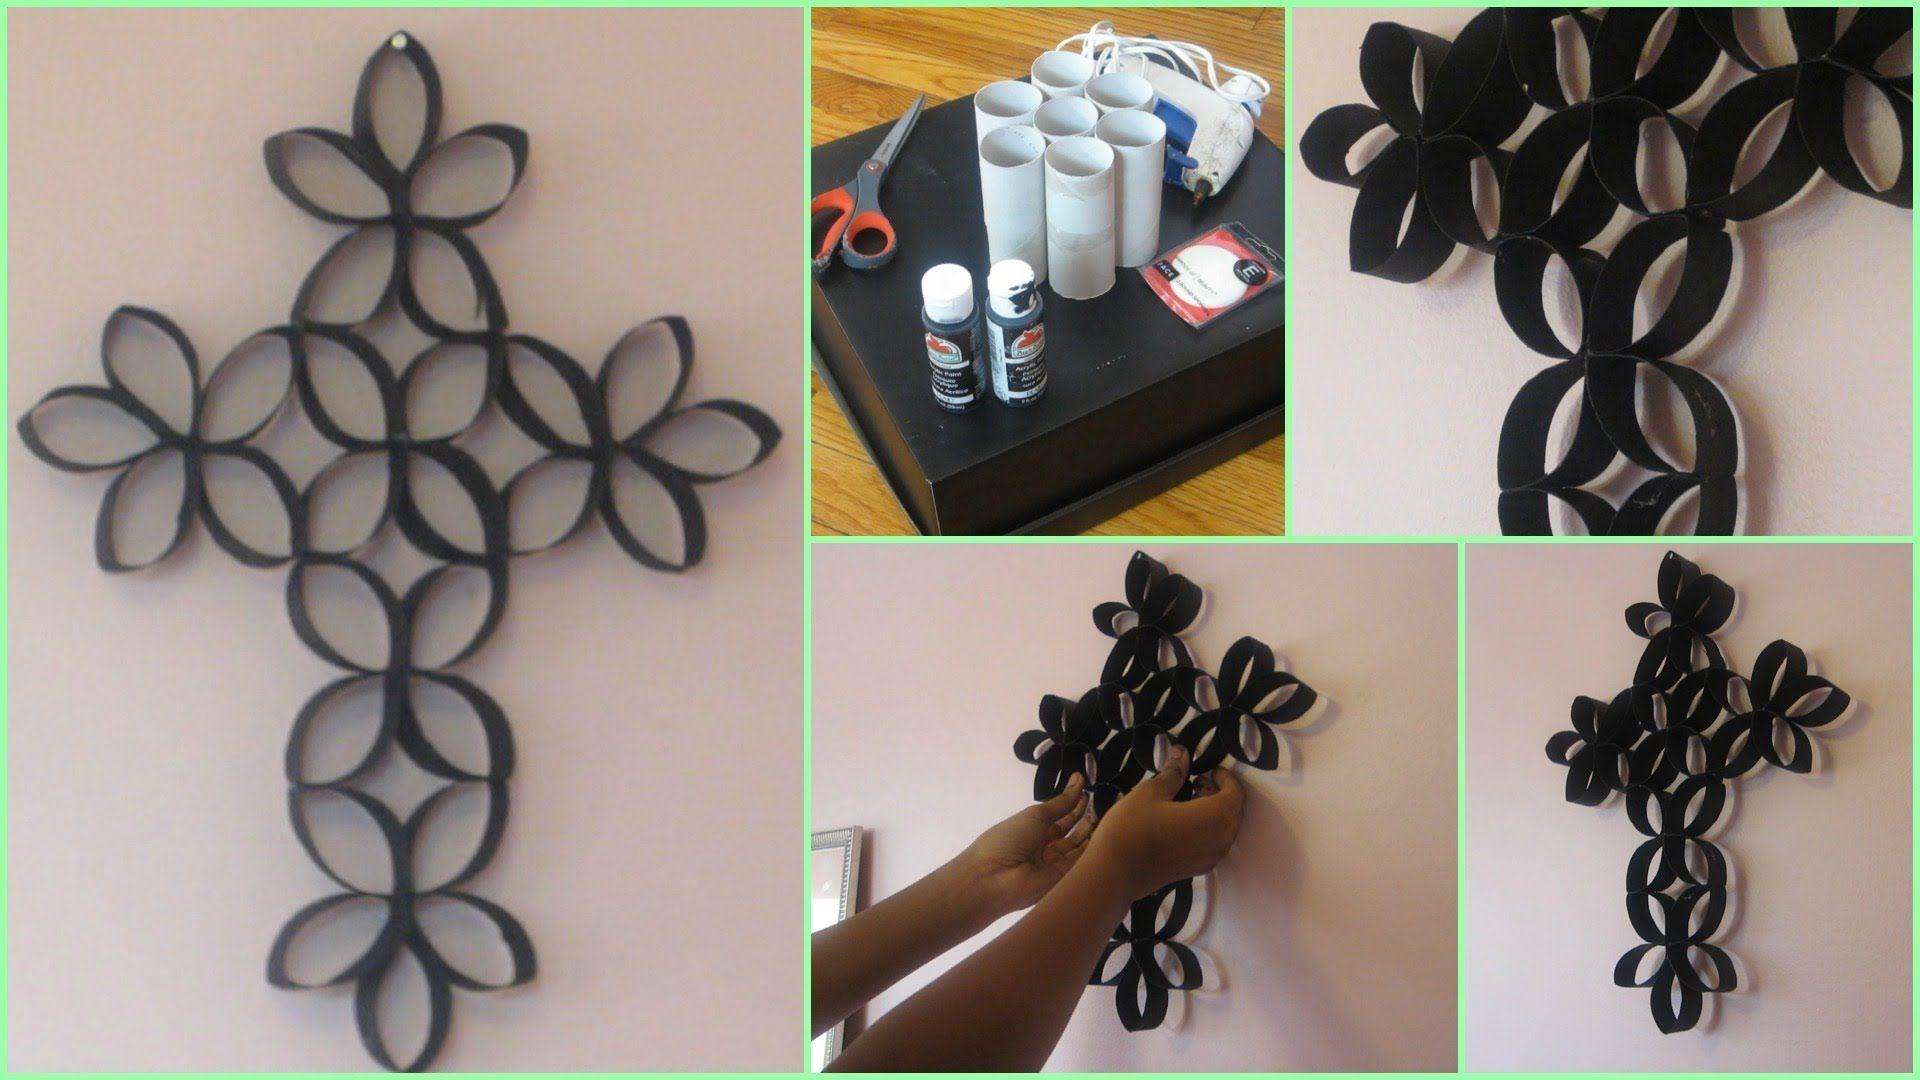 Diy 3d paper roll flower wall art fab art diy pinterest cross diy 3d paper roll flower art4 fabartdiy mightylinksfo